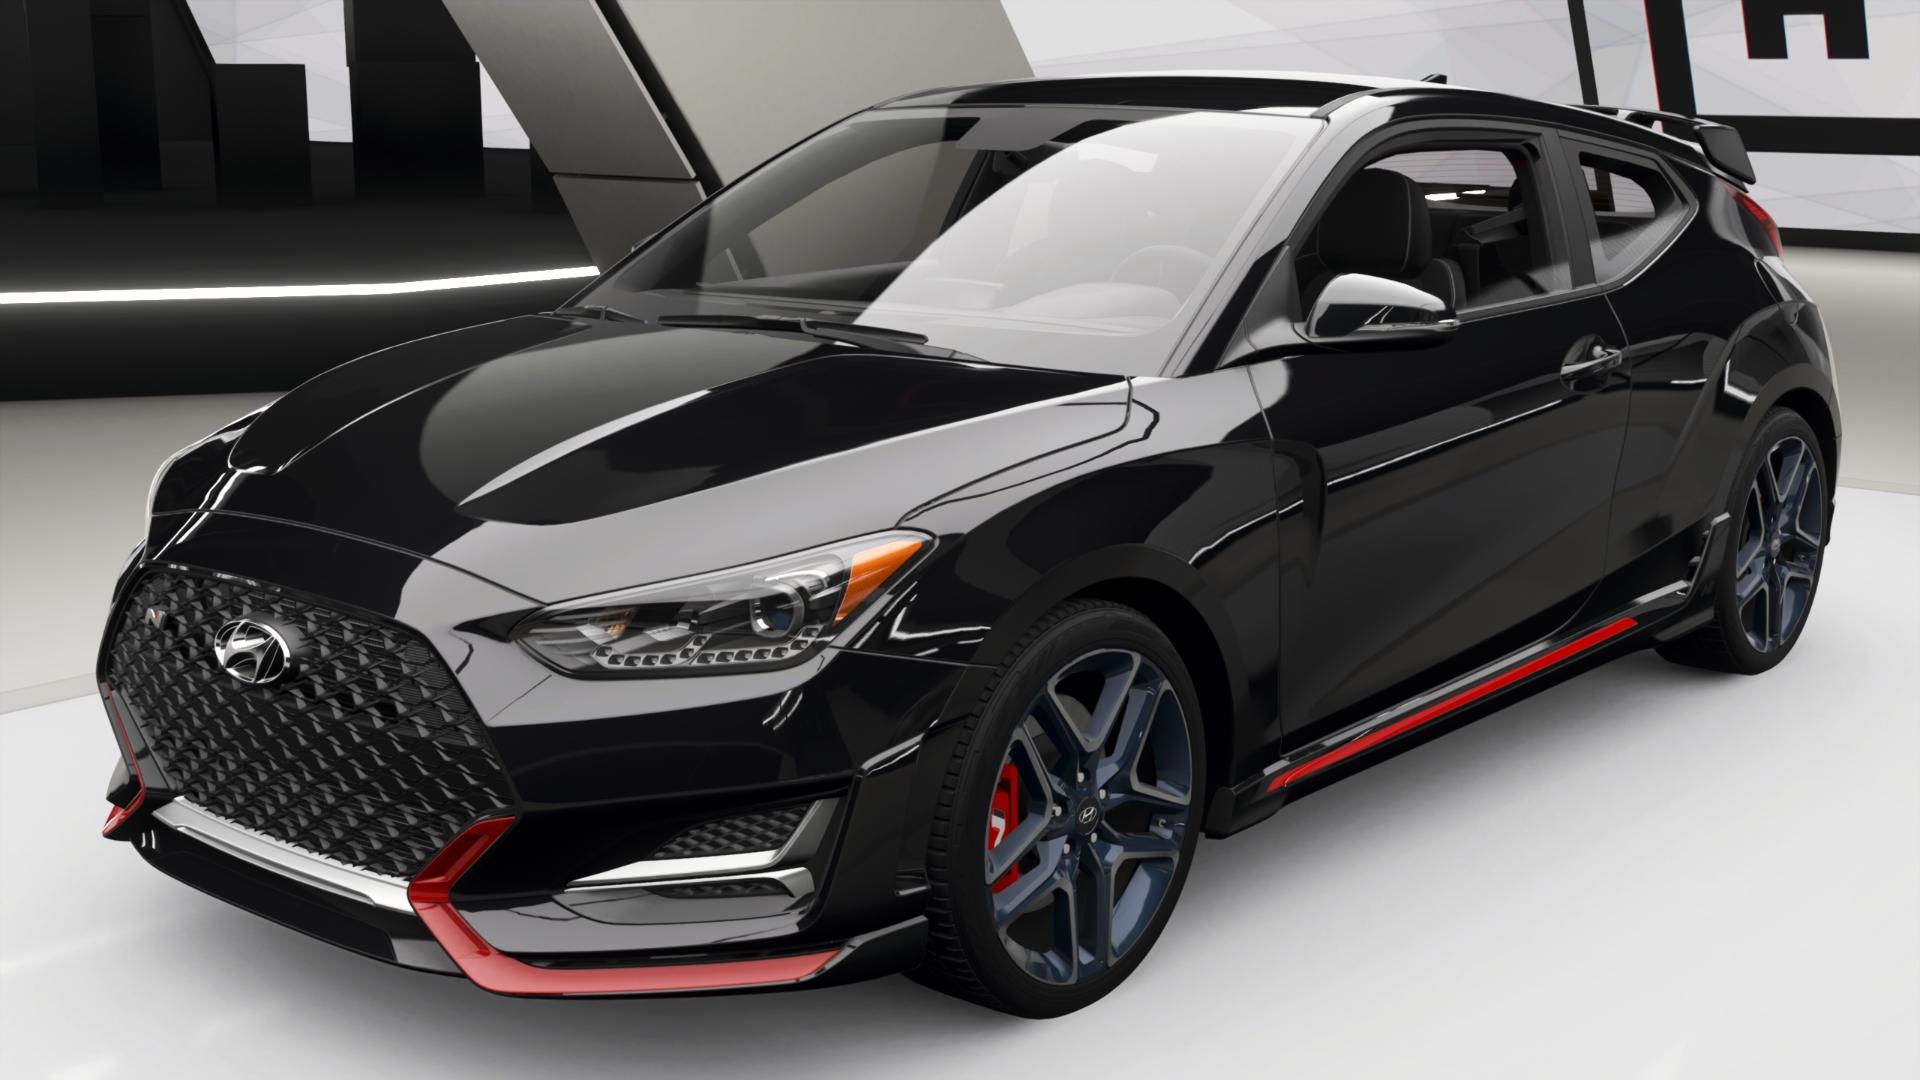 Hyundai Veloster N | Forza Motorsport Wiki | FANDOM powered